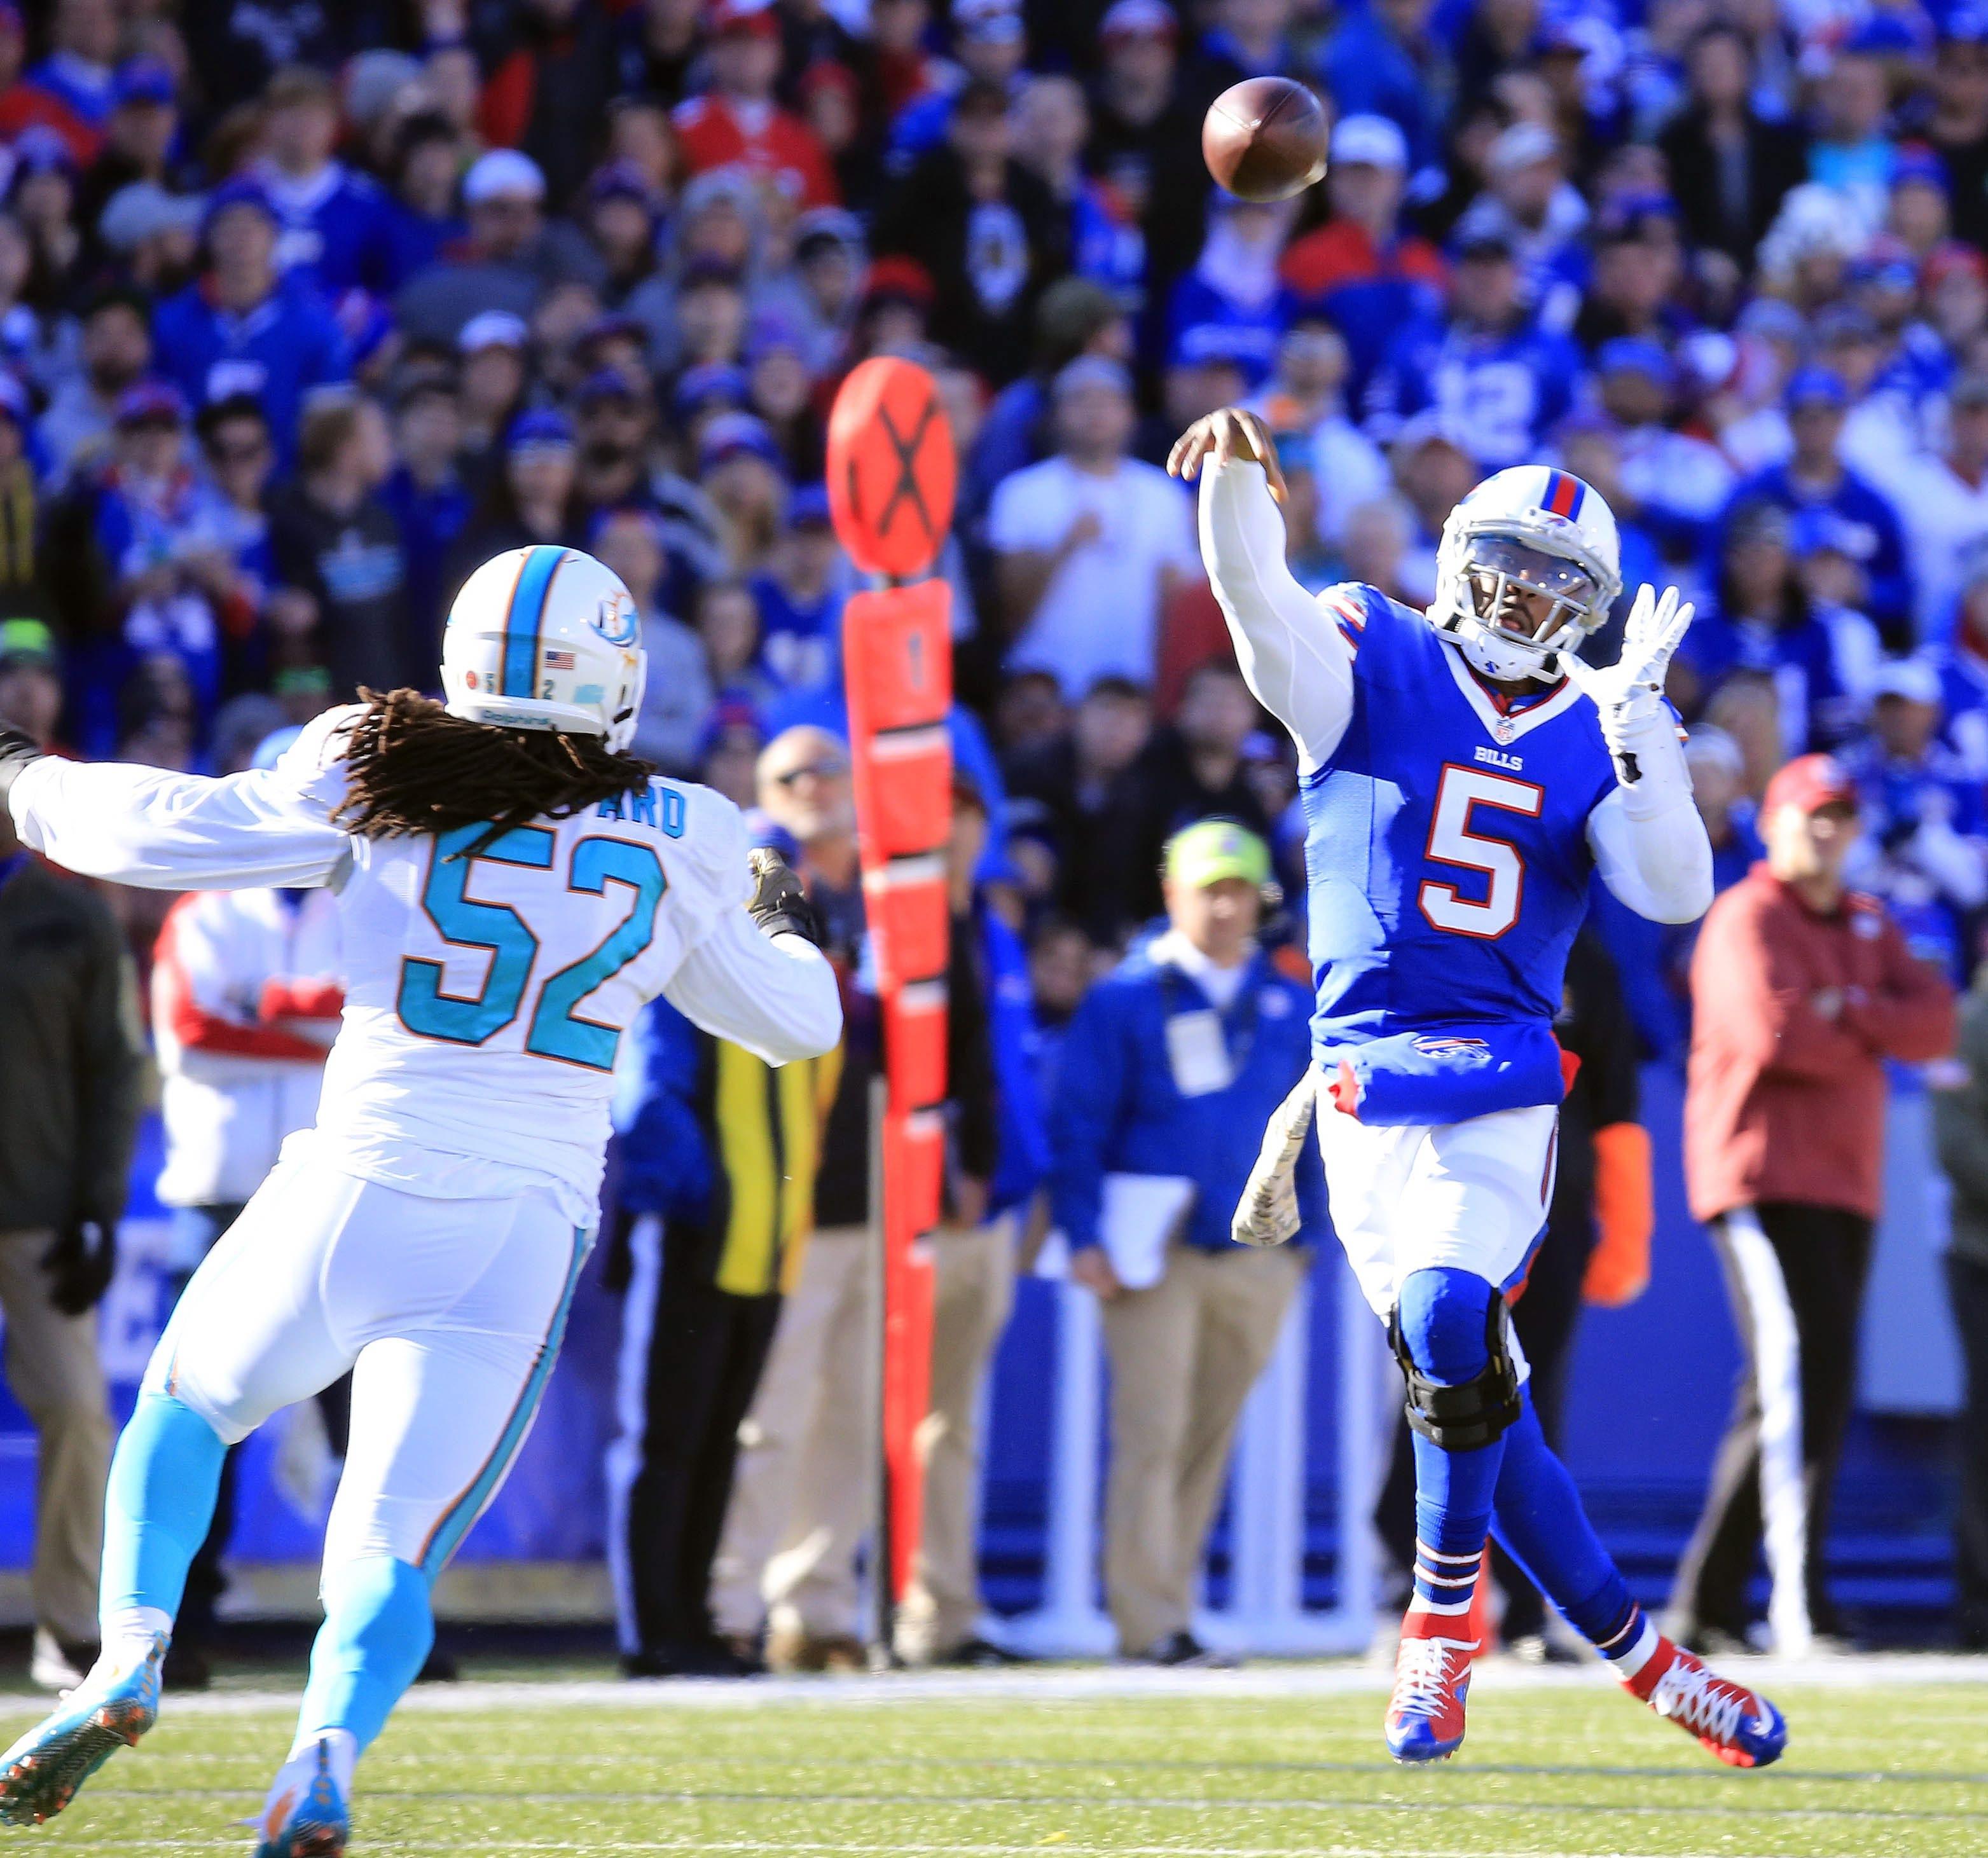 Buffalo Bills quarterback Tyrod Taylor throws against the Miami Dolphins during the first quarter at Ralph Wilson Stadium on Sunday, Nov. 8, 2015.  (Harry Scull Jr./Buffalo News)